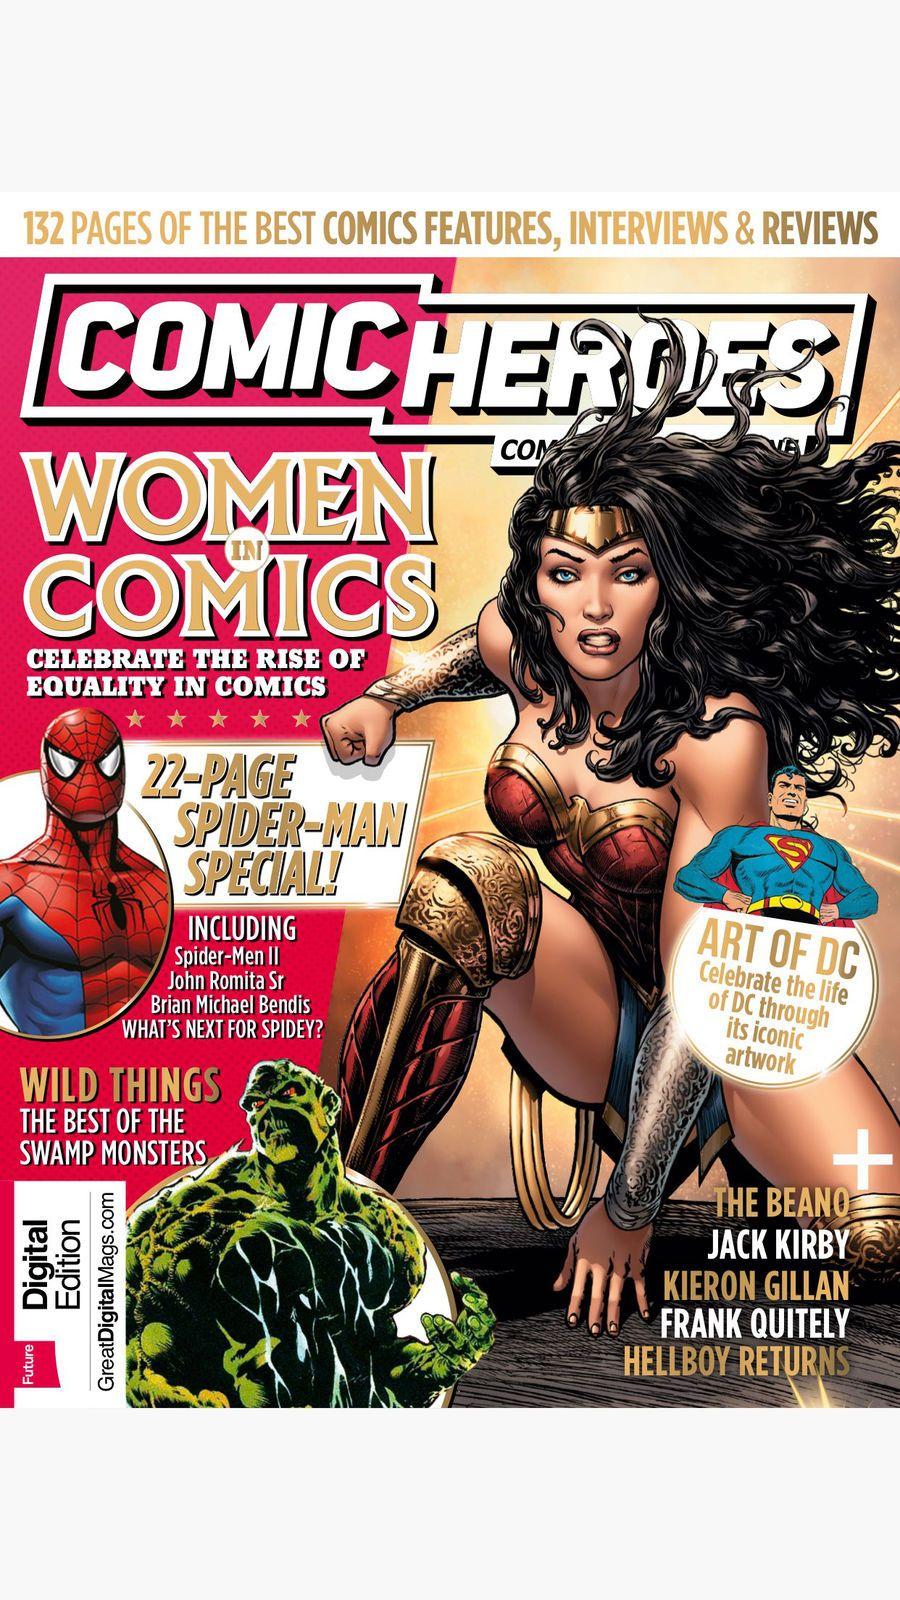 Comic Heroes: the superhero comics magazine #Lifestyle#plc